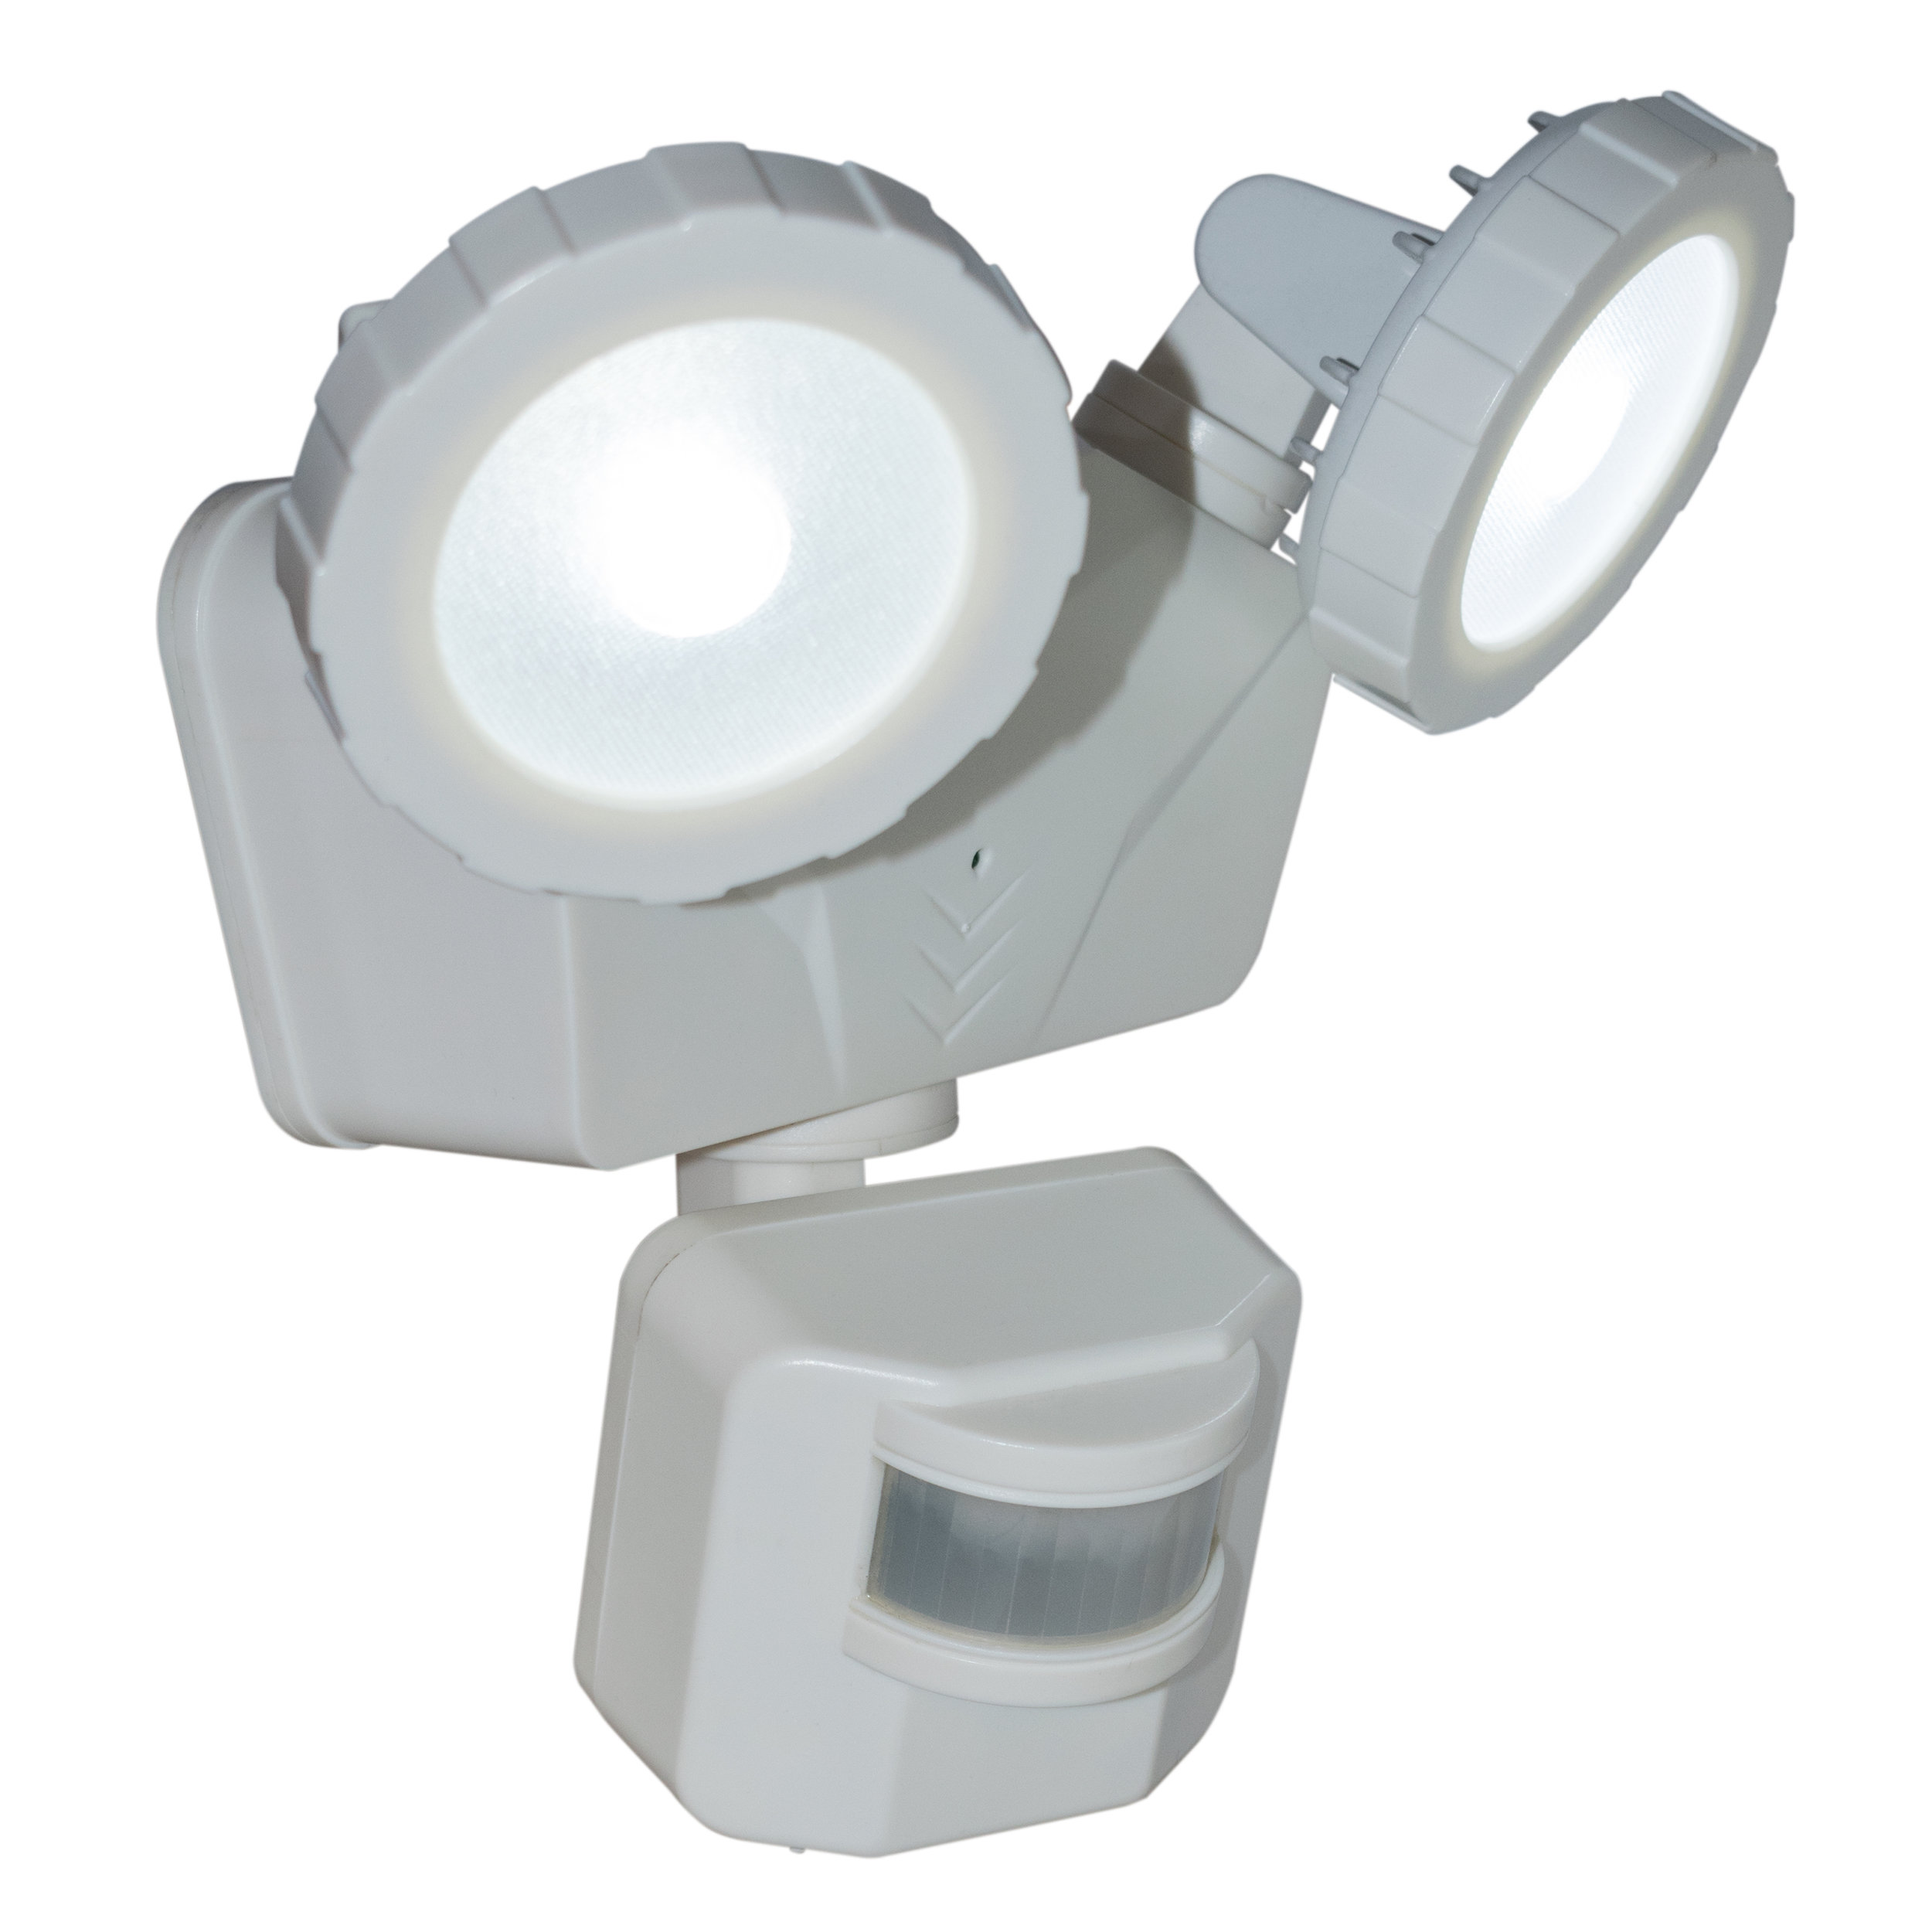 Novolink NL-DSW2 Solar Security Light, Isometric with Light ON